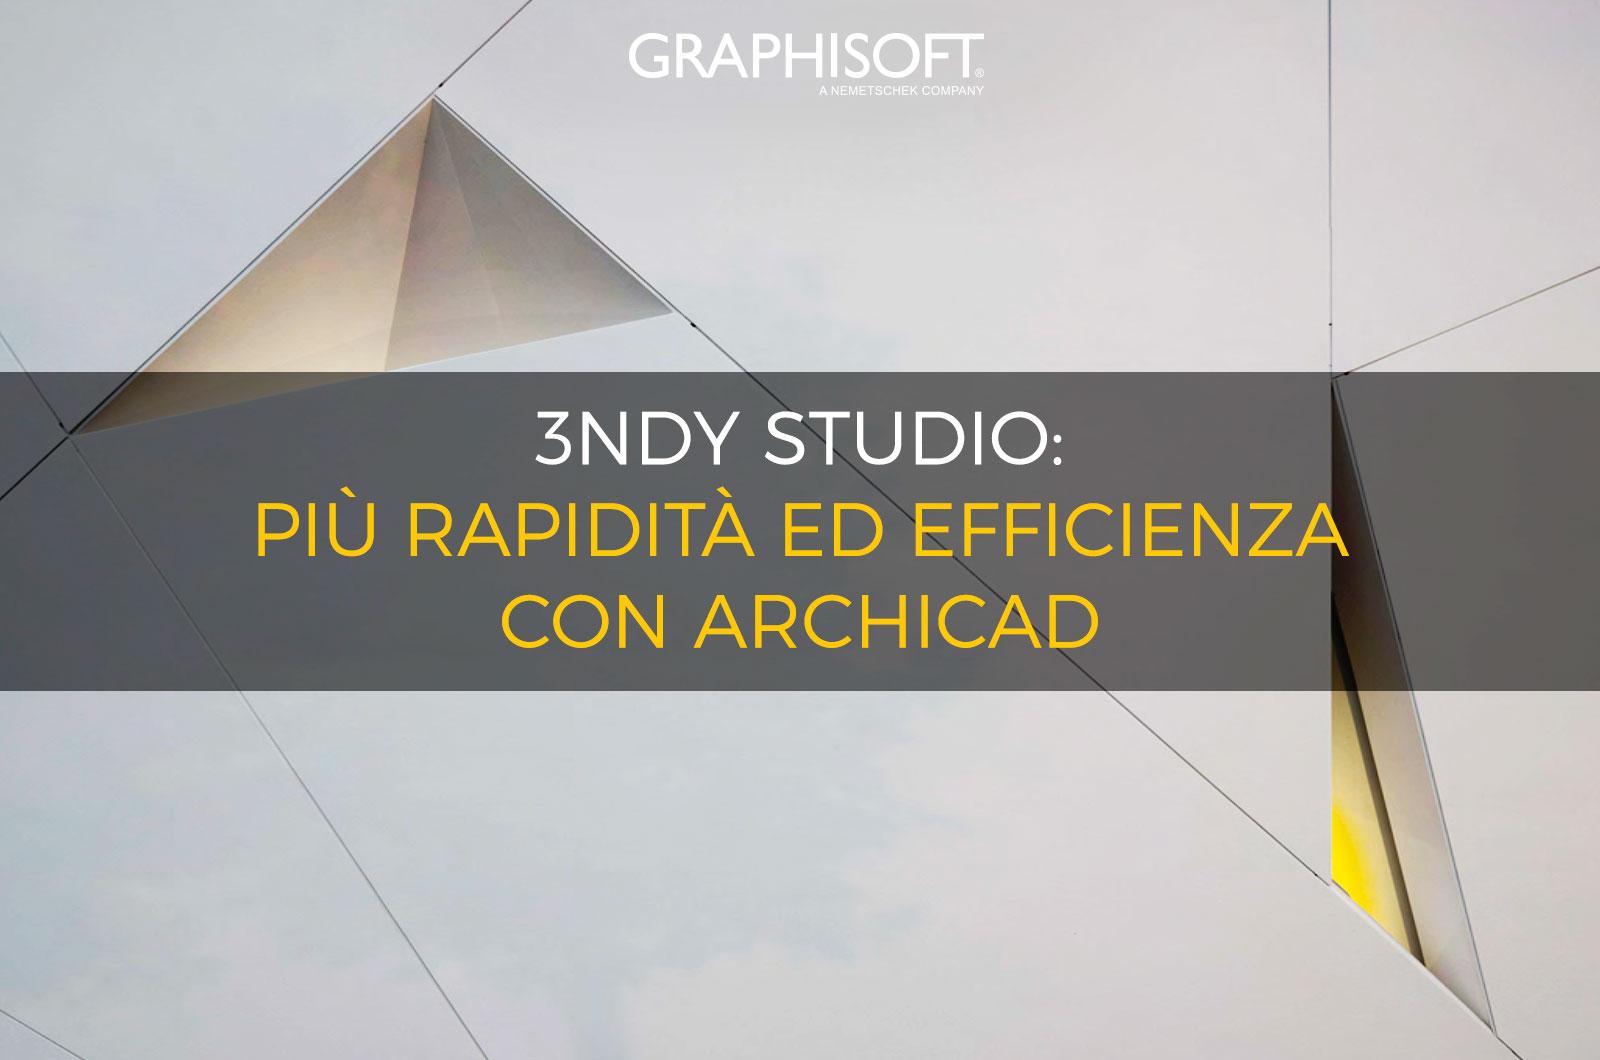 GRAPHISOFT_3ndy-studio